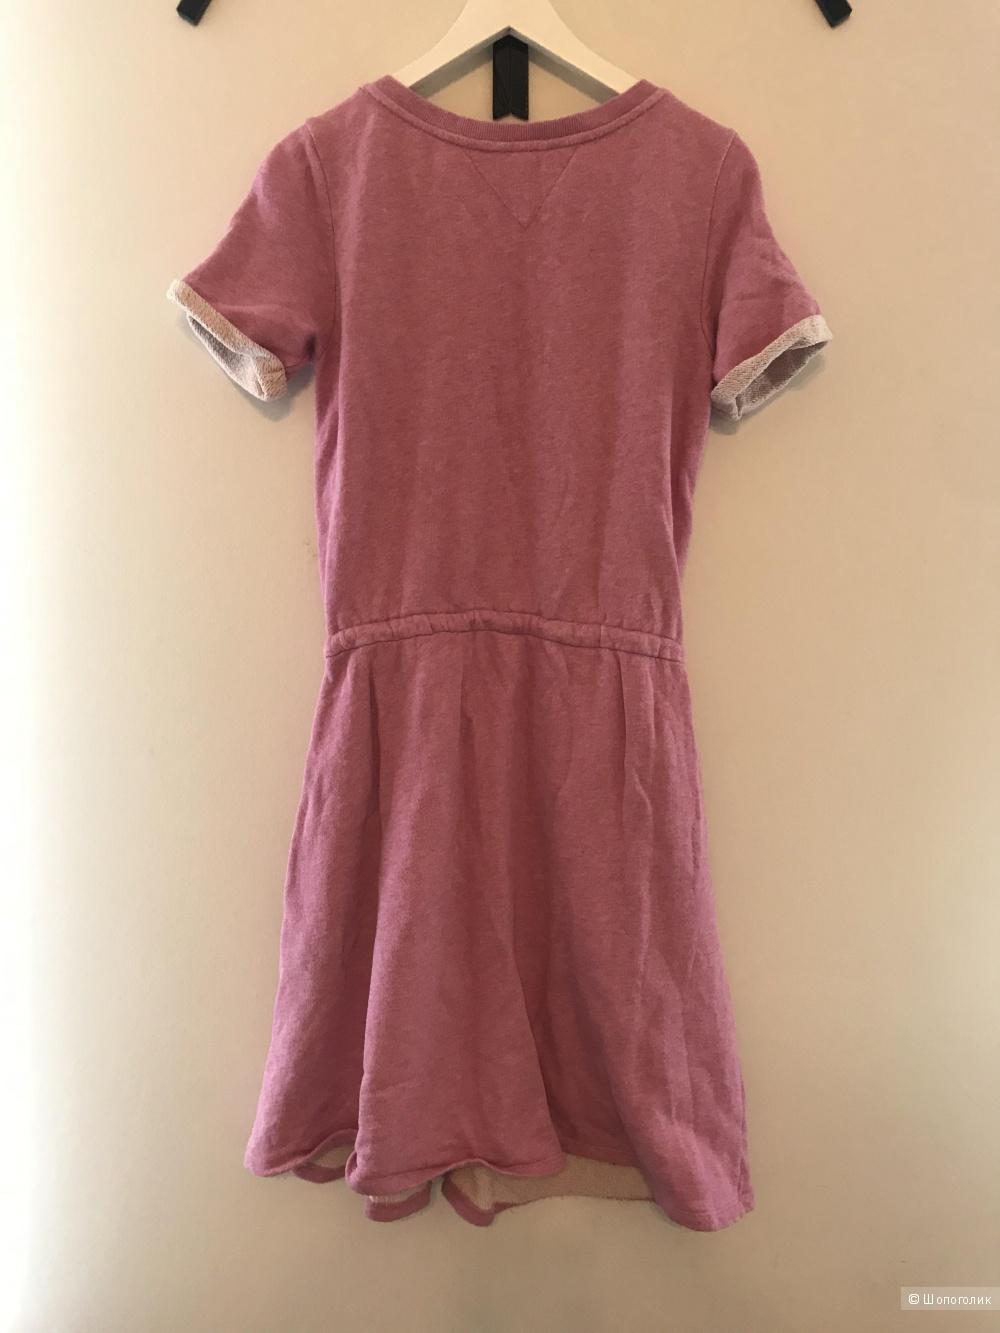 Платье Tommy Hilfiger S-M розовое